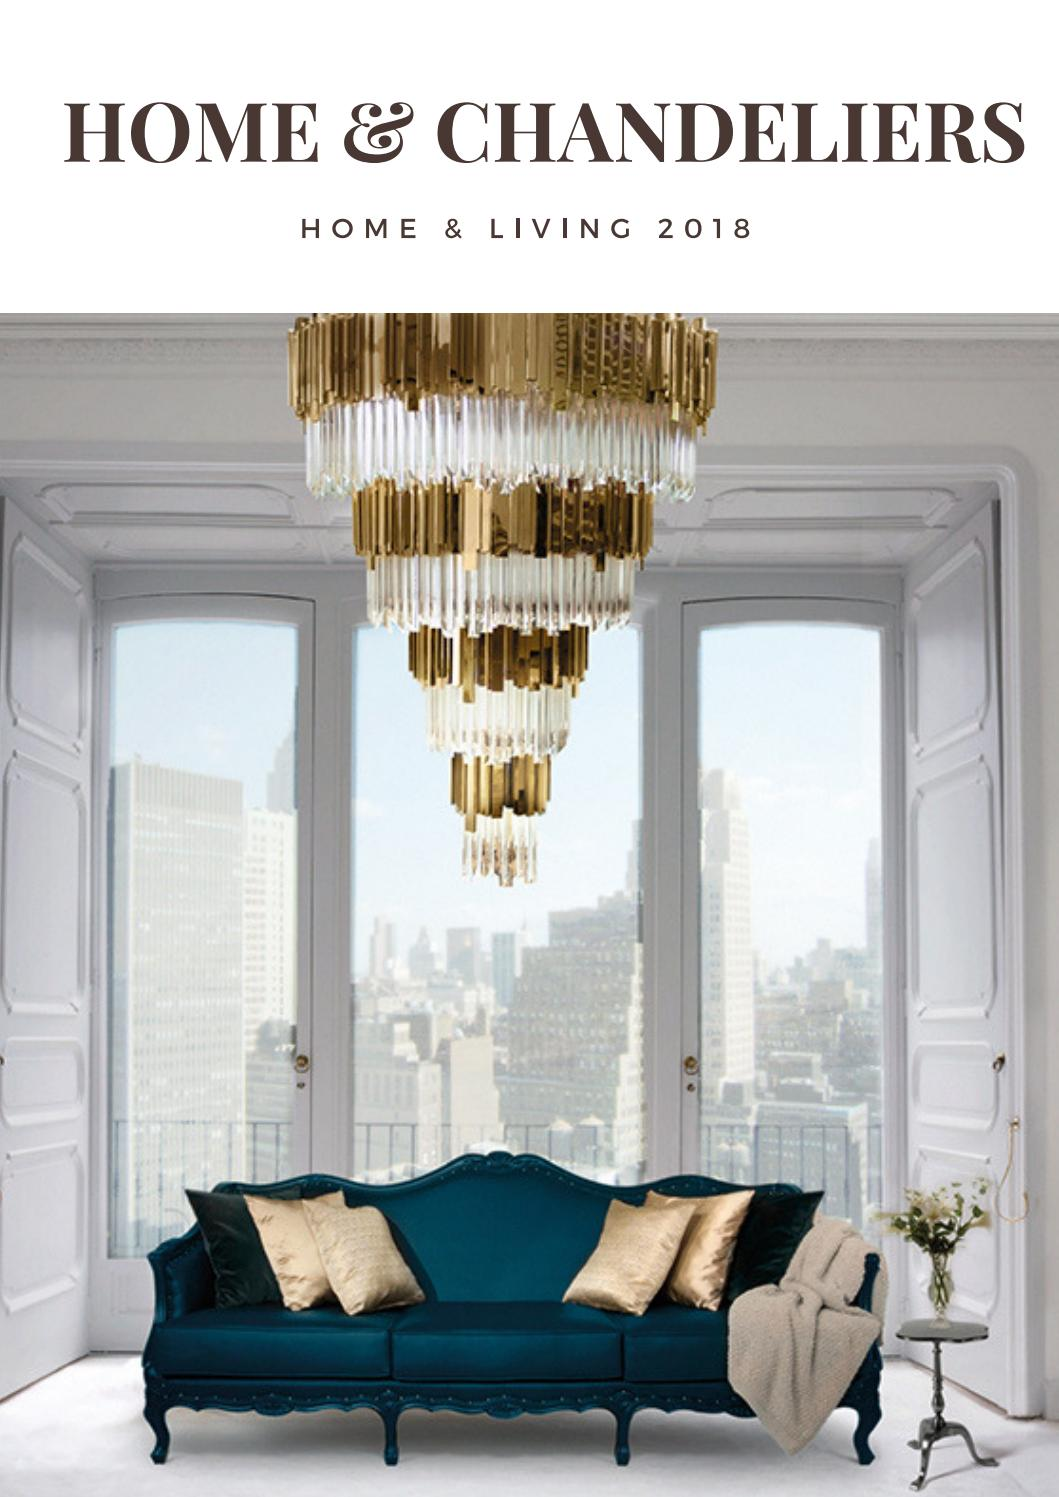 2018 Interior Home Color Trends: Luxury Chandeliers Decor Home Ideas Interior Design Trends